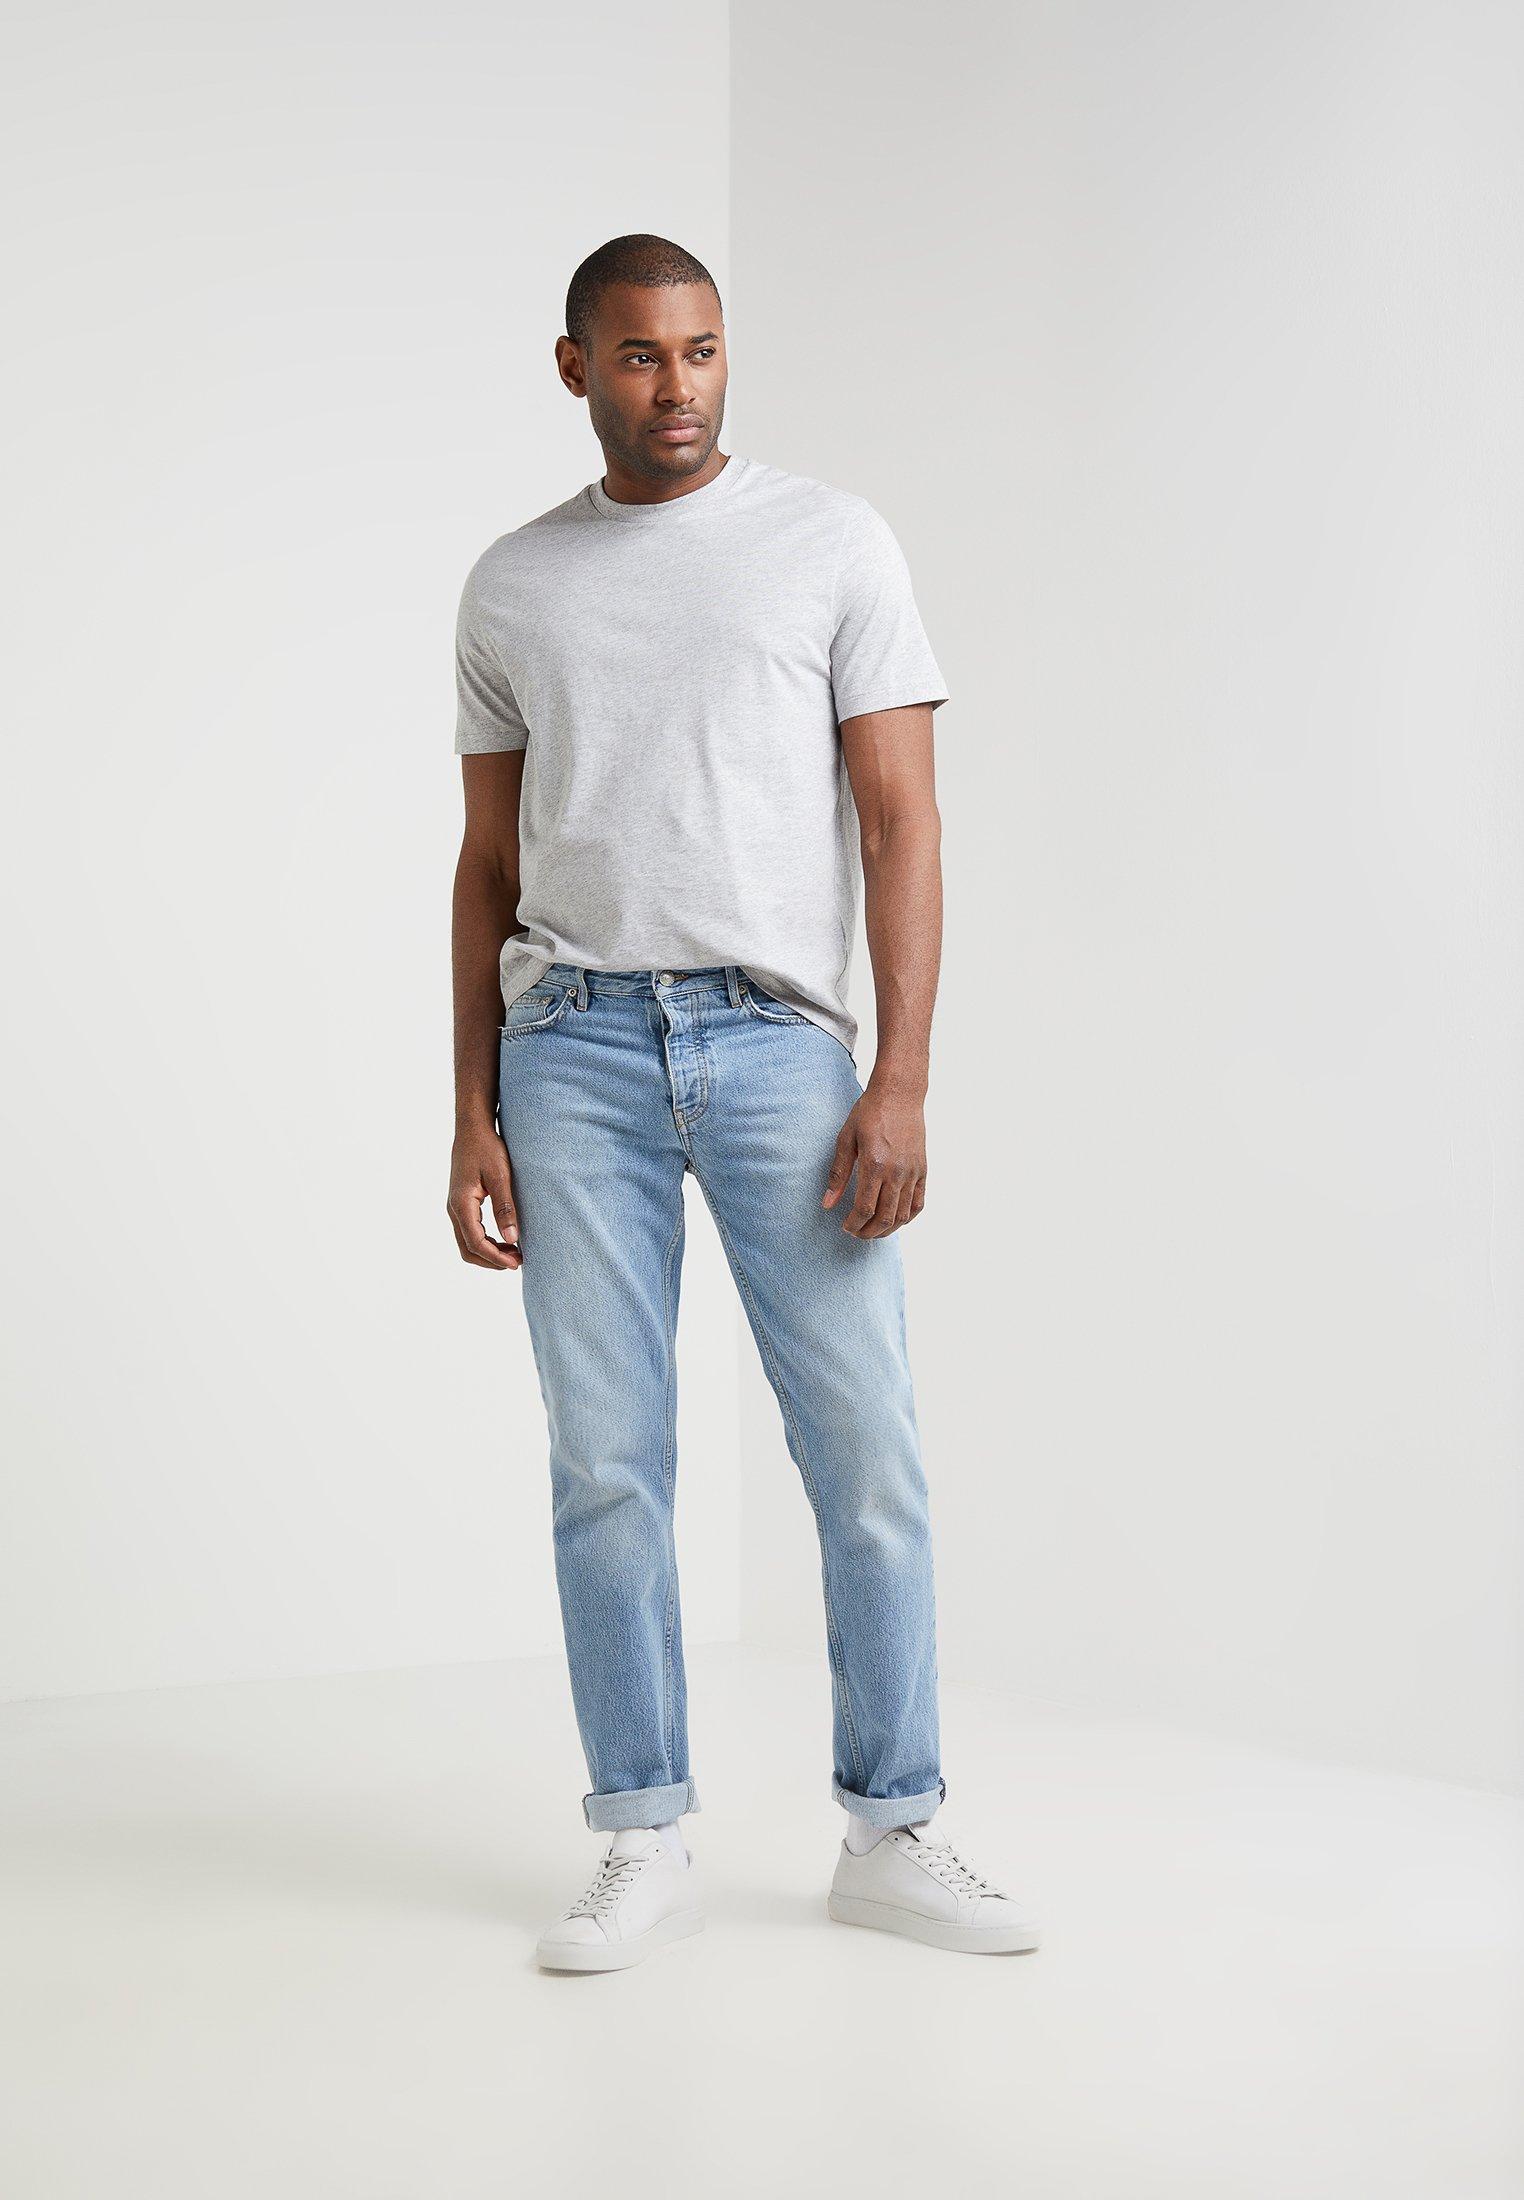 Filippa K Single Classic Tee - Basic T-shirt Light Grey UK